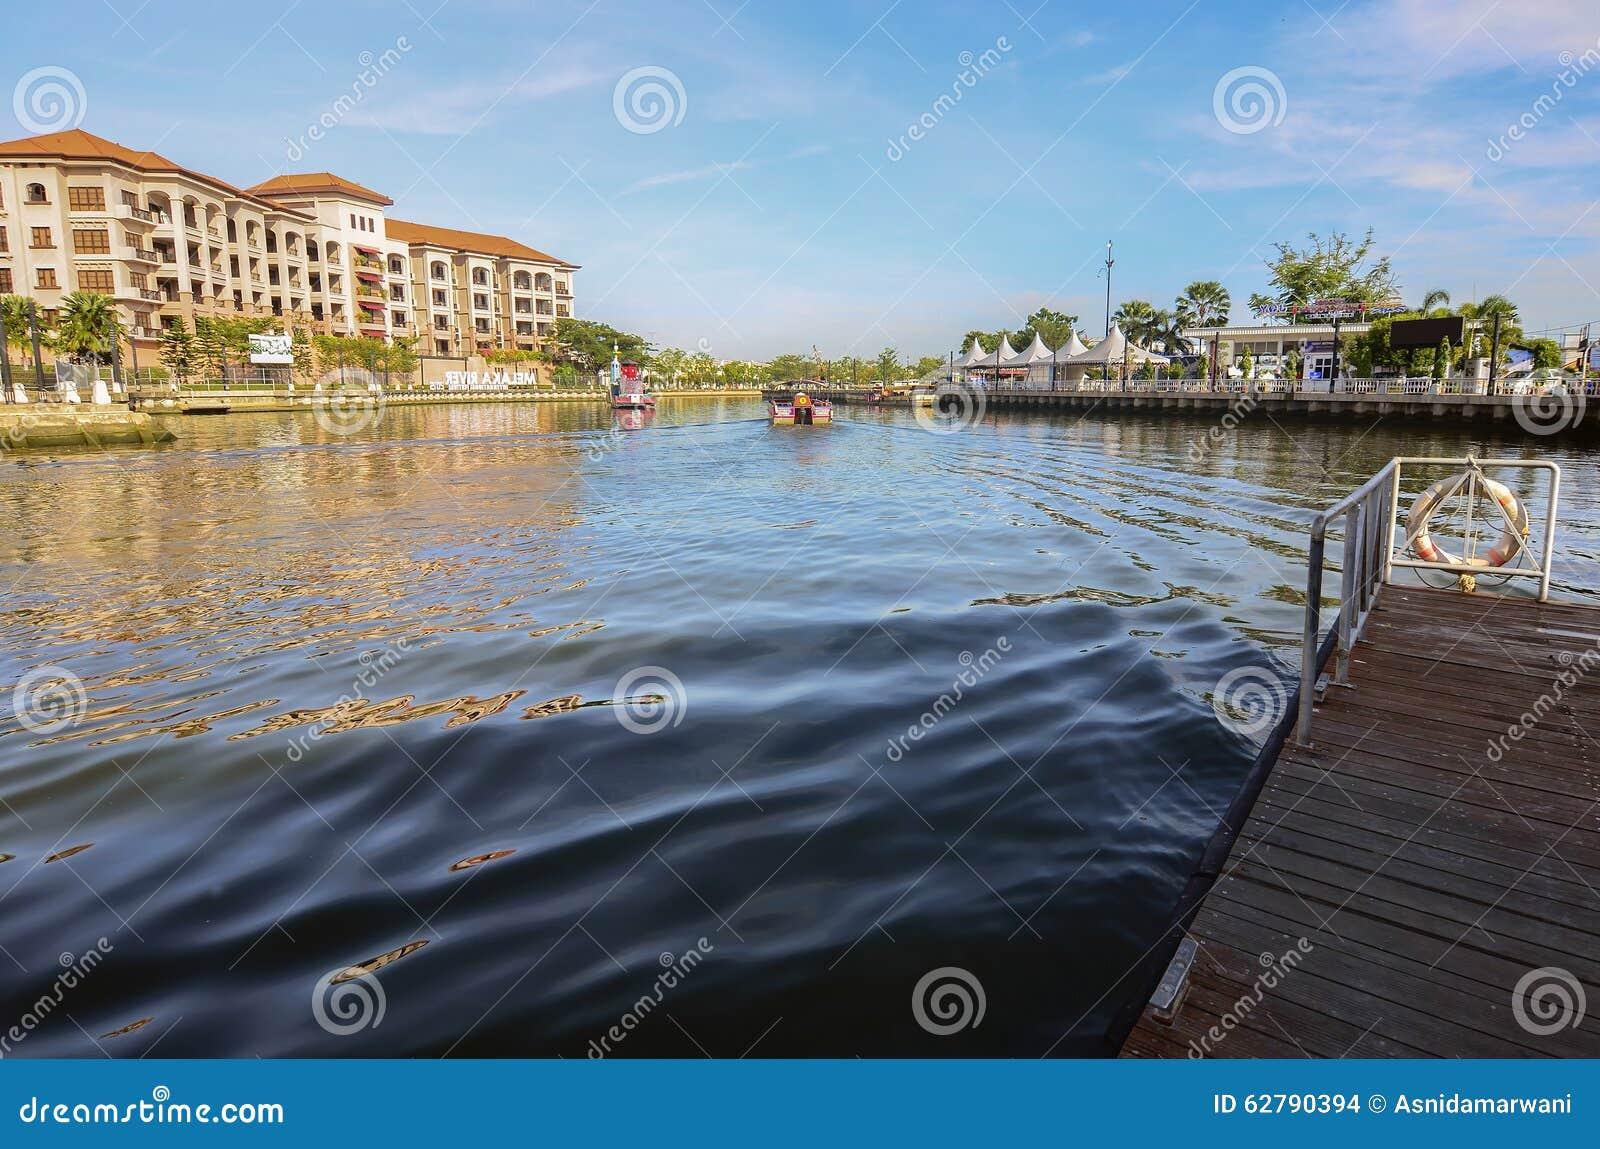 Hotels near Malacca River Cruise, Malacca - BEST HOTEL